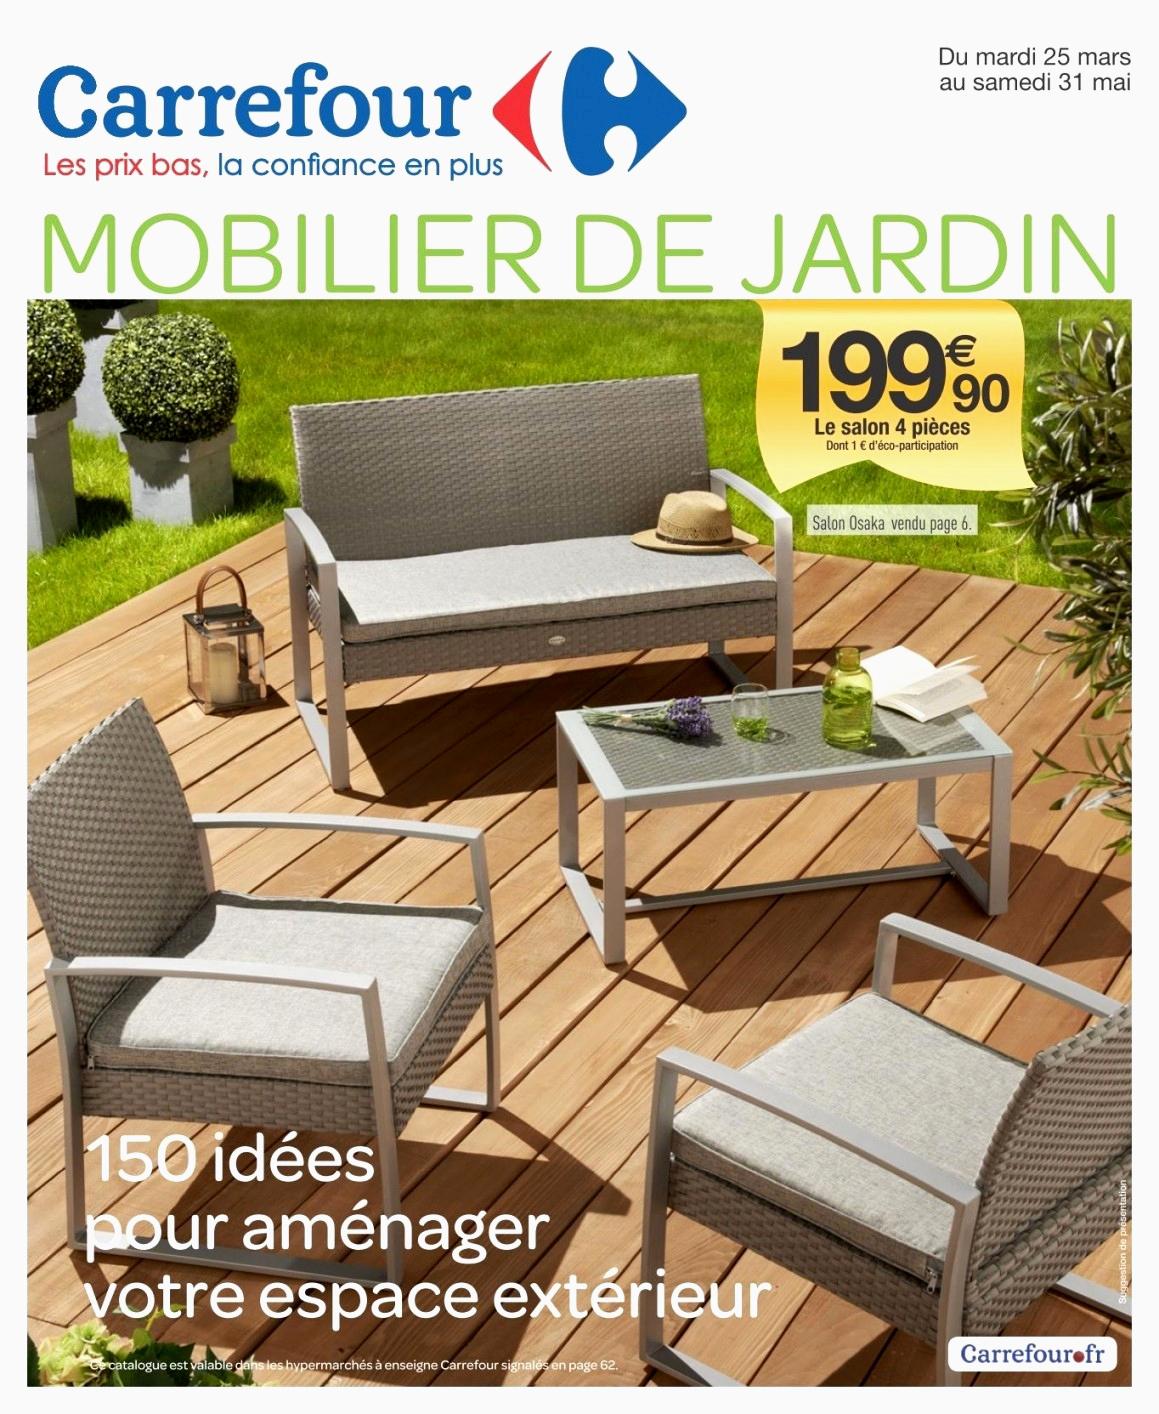 Salon De Jardin Mozaique Incroyables Salon De Jardin ... pour Intermarché Salon De Jardin